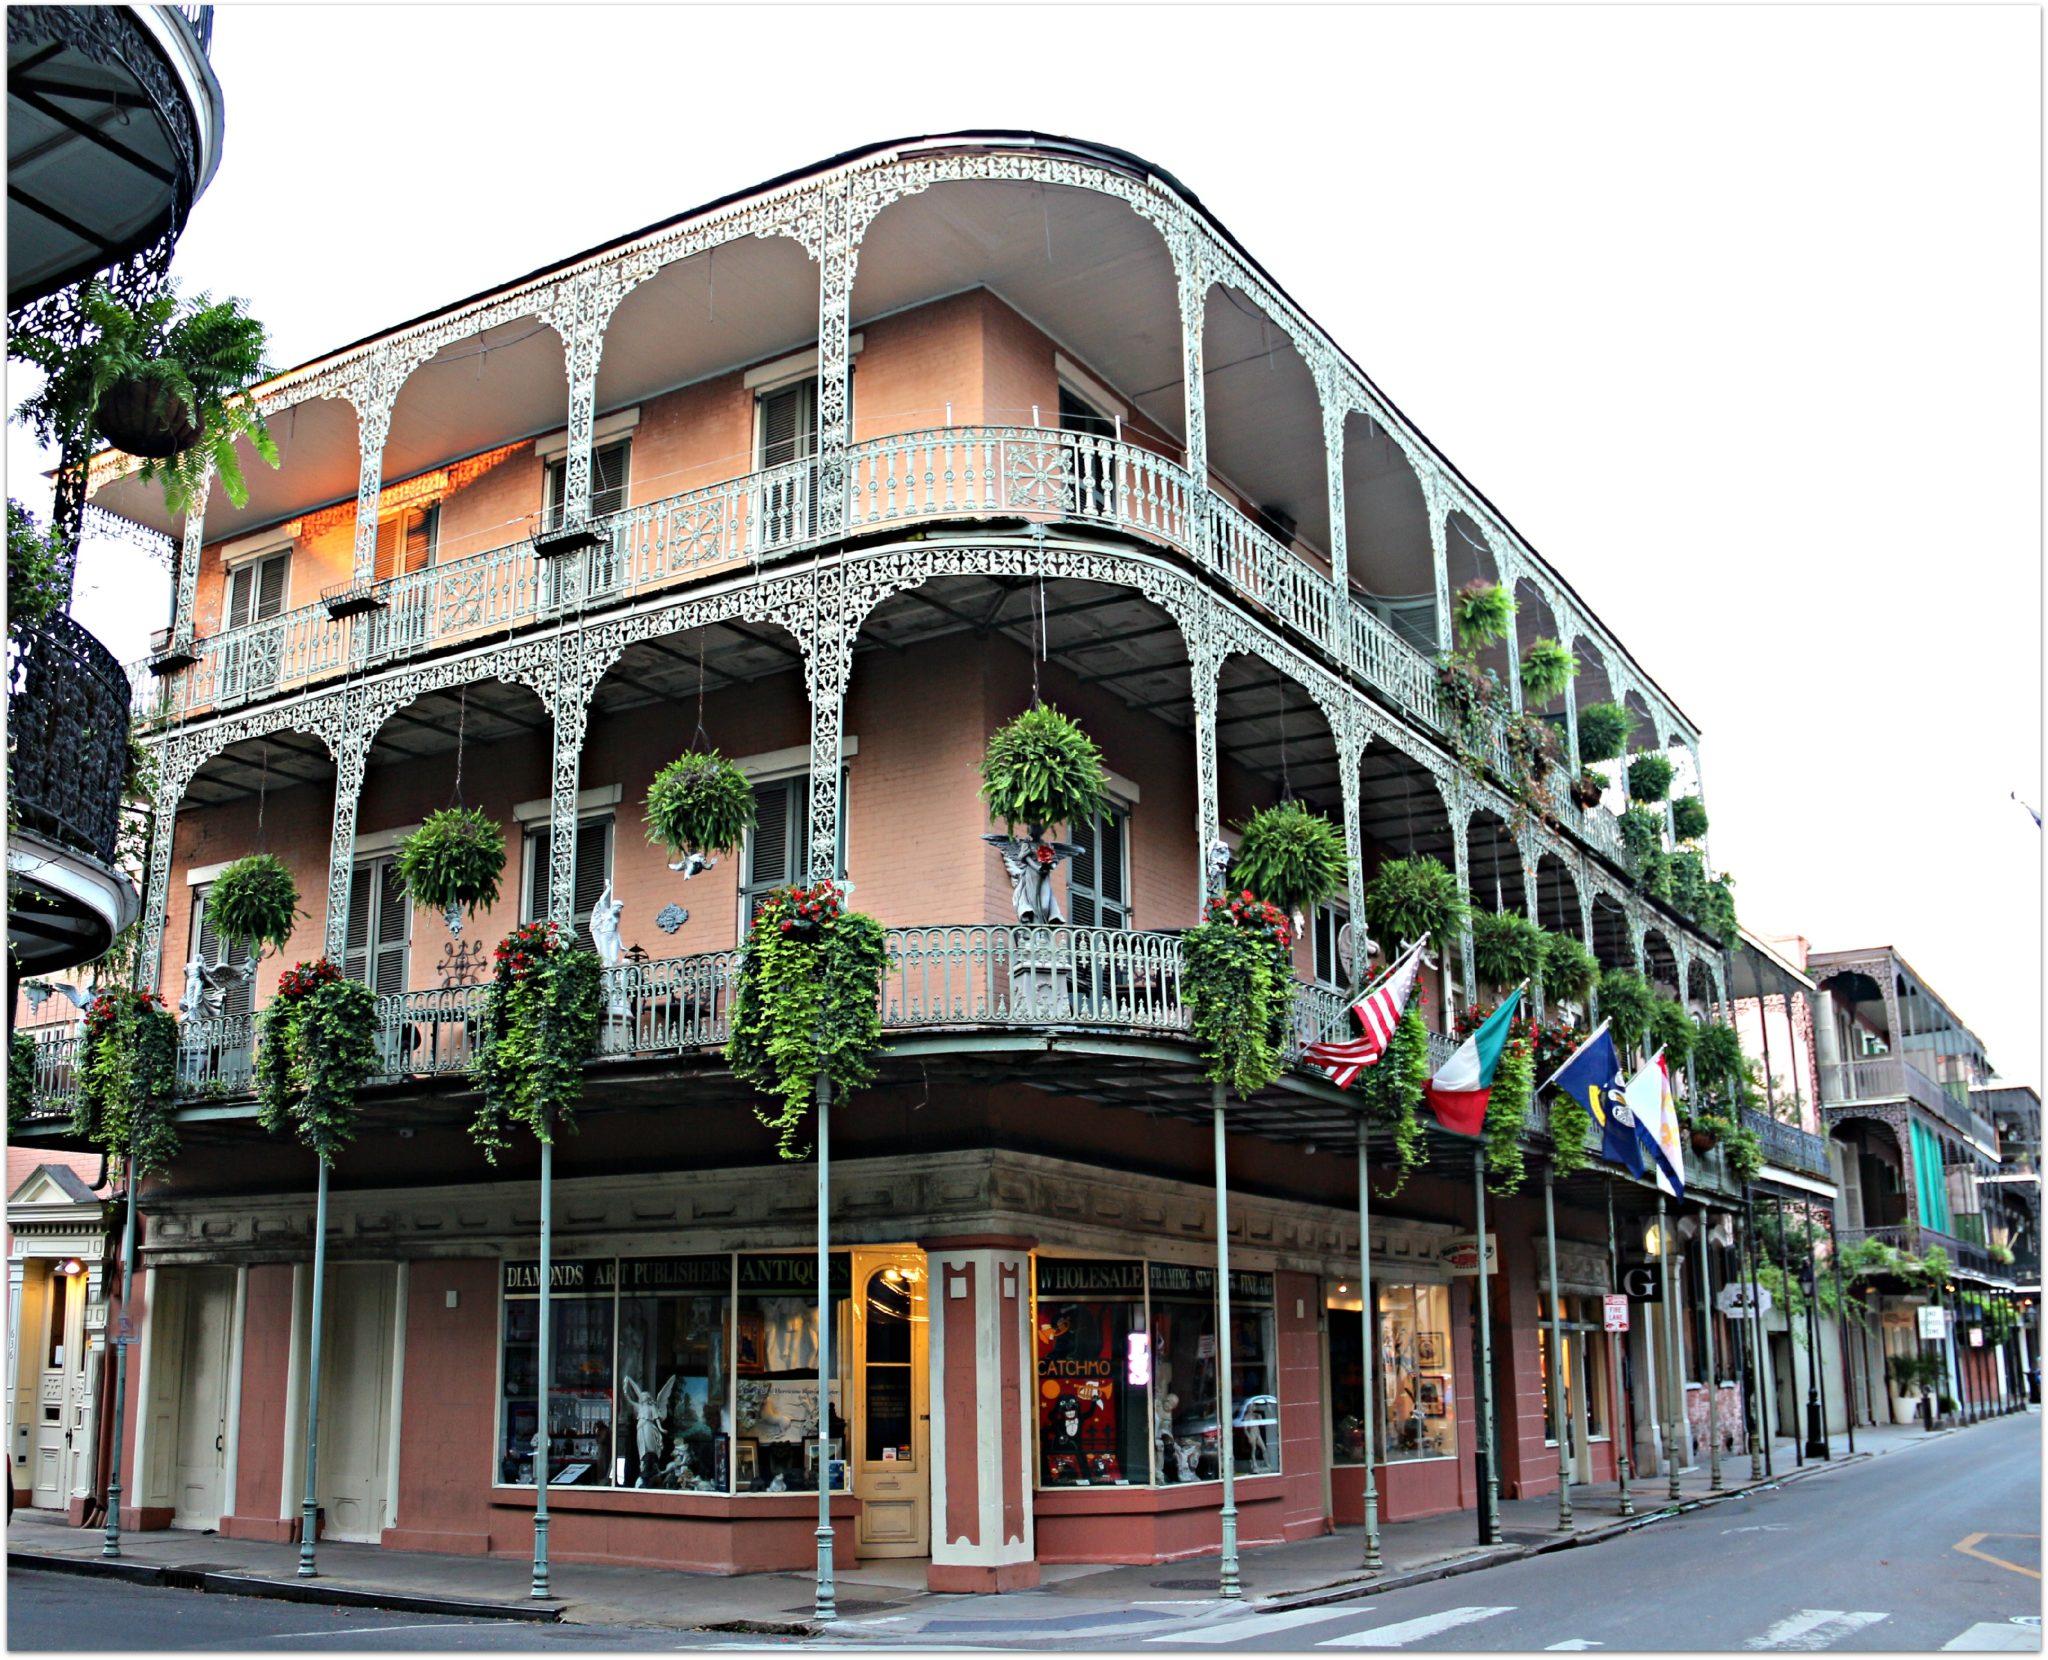 Royal Street Corners in New Orleans